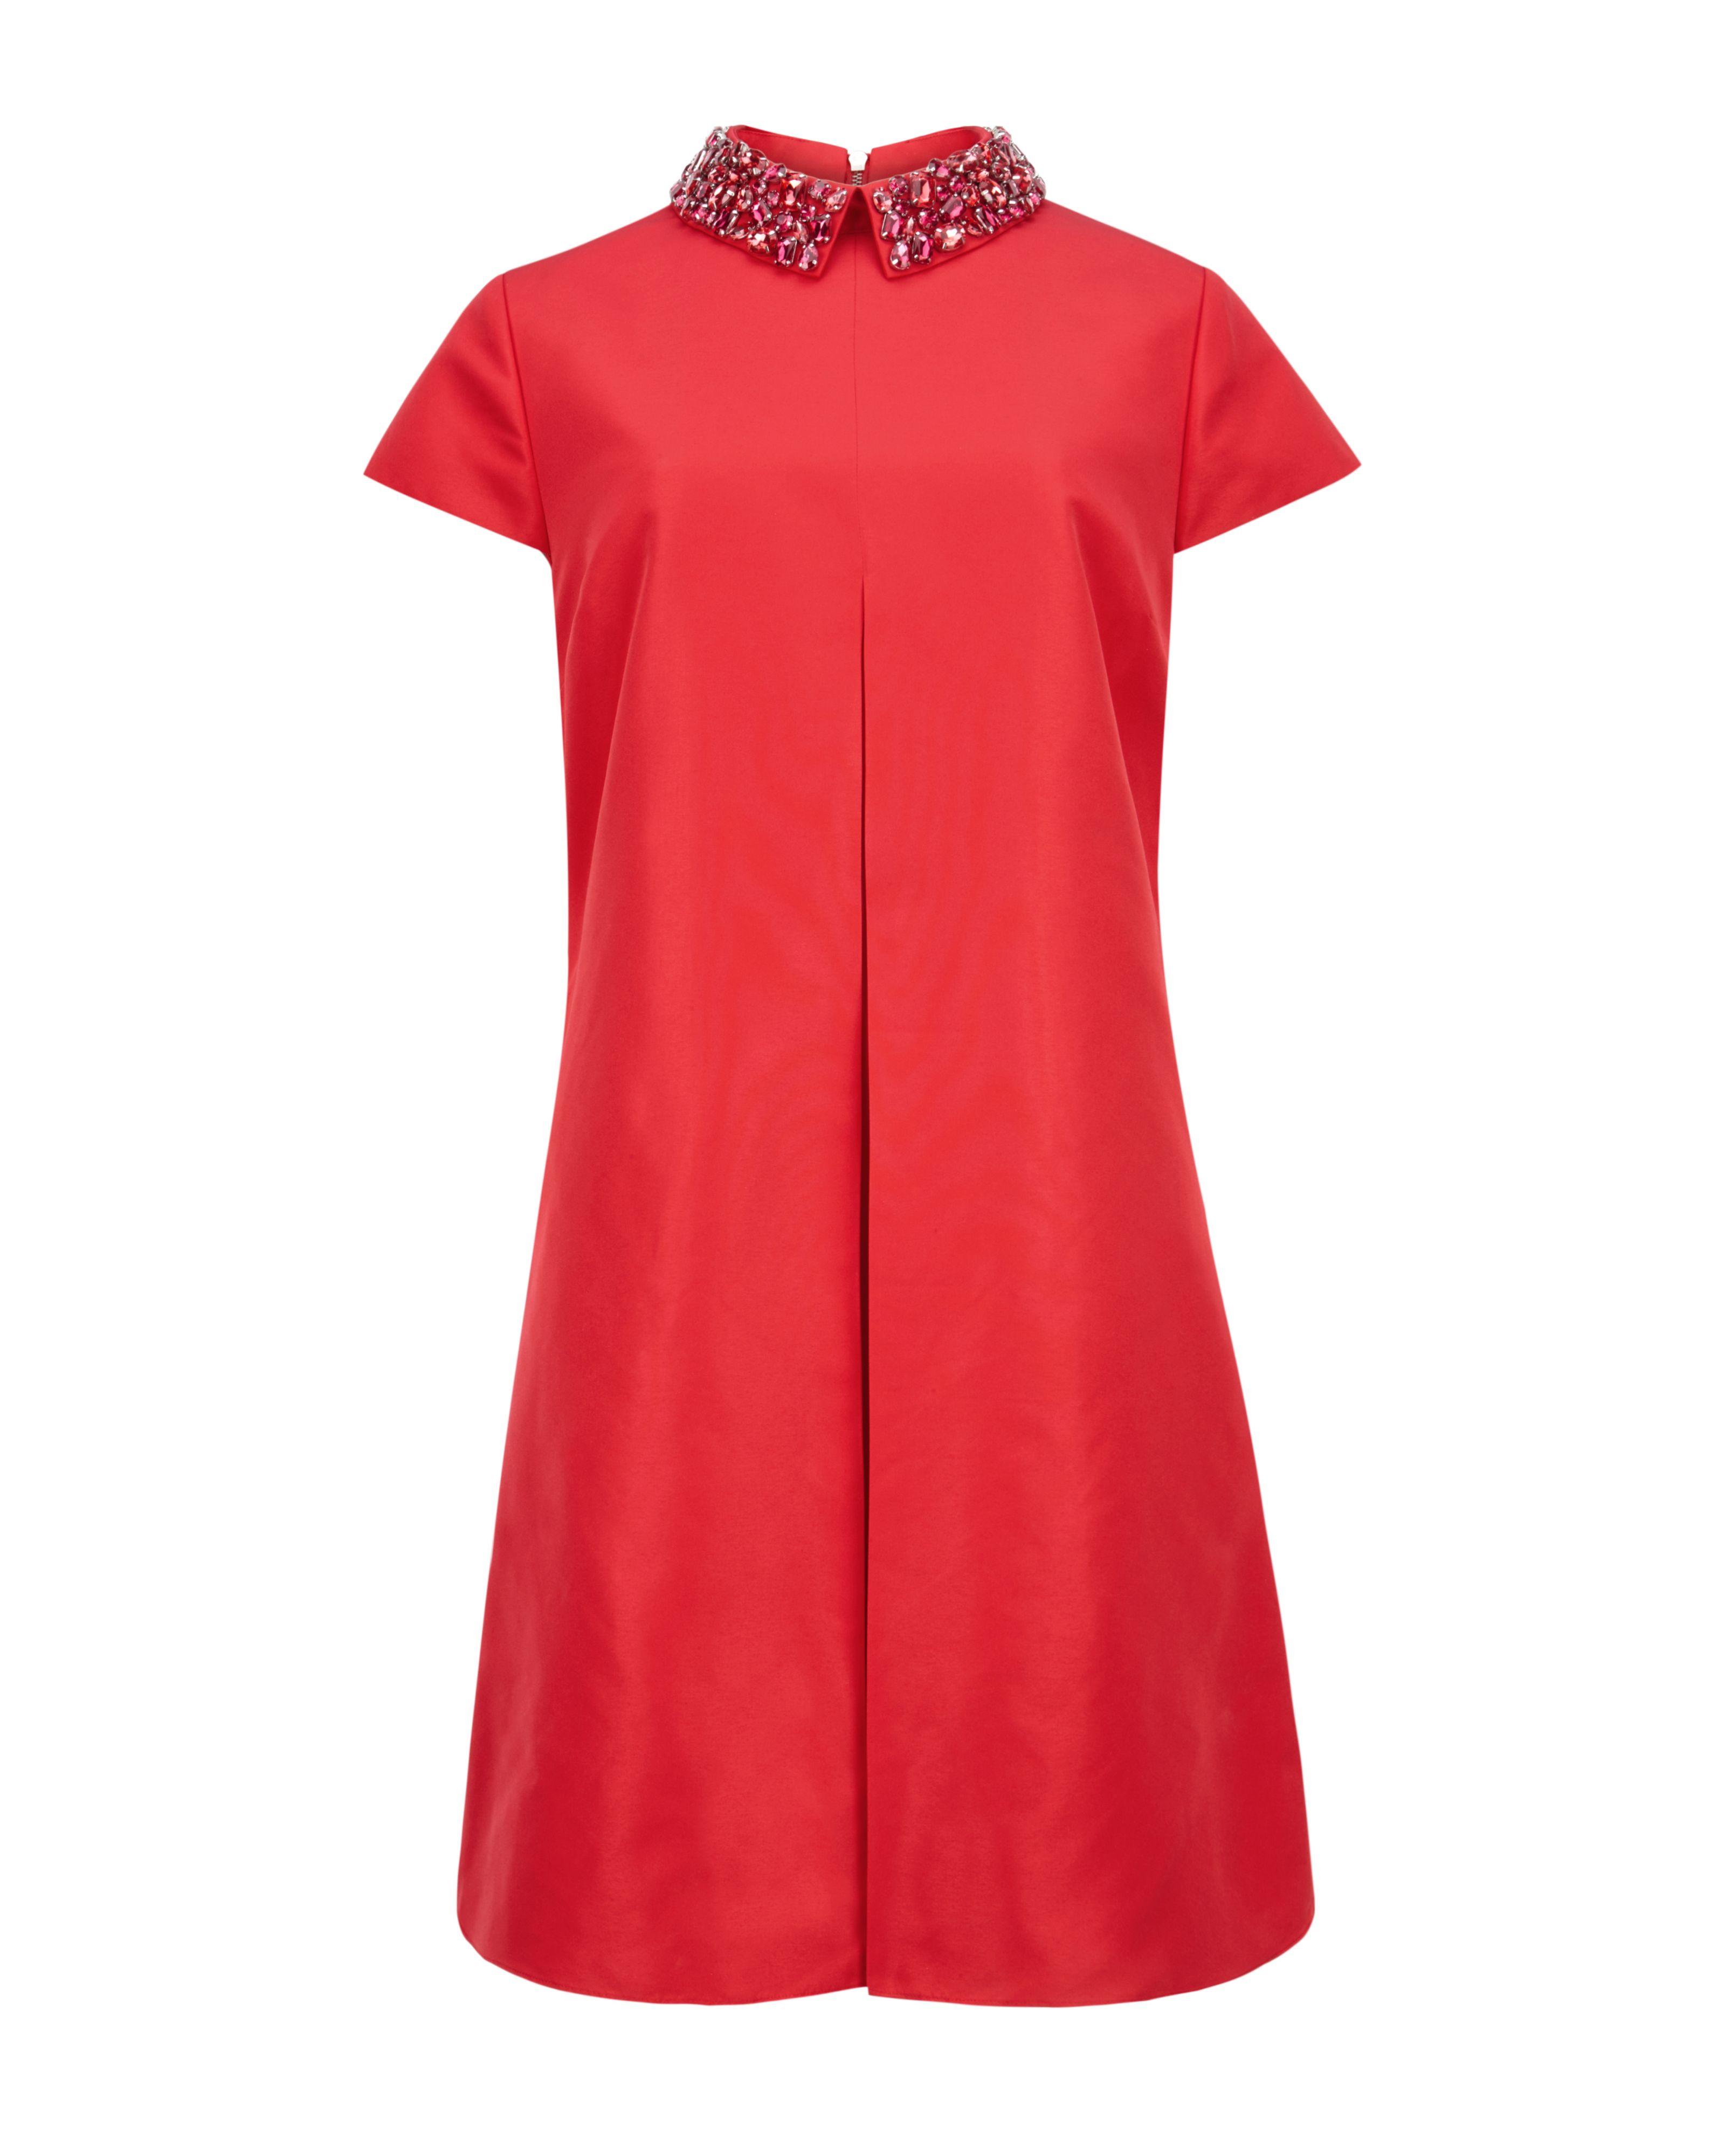 New Slim Pencil Dress Sexy Square Collar Women Dress High Quality Dress